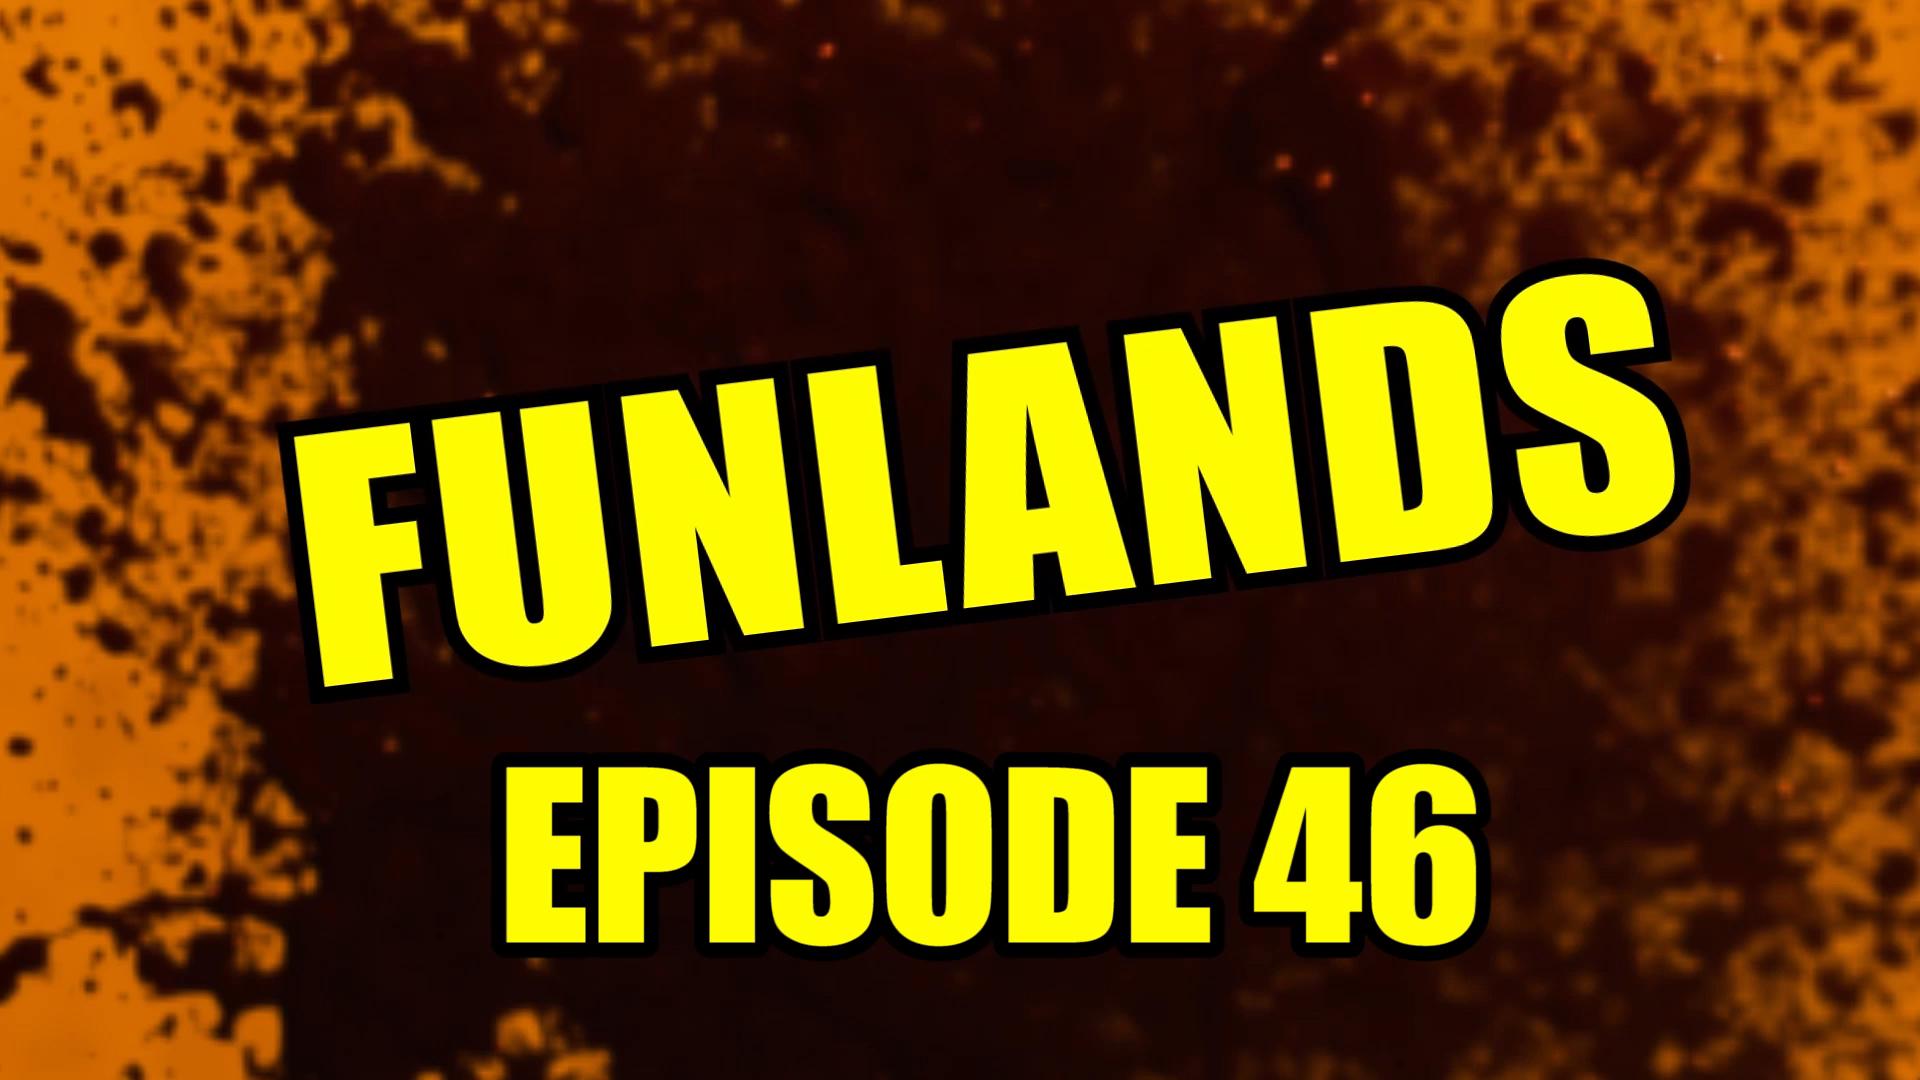 Funlands Episode 46.jpg